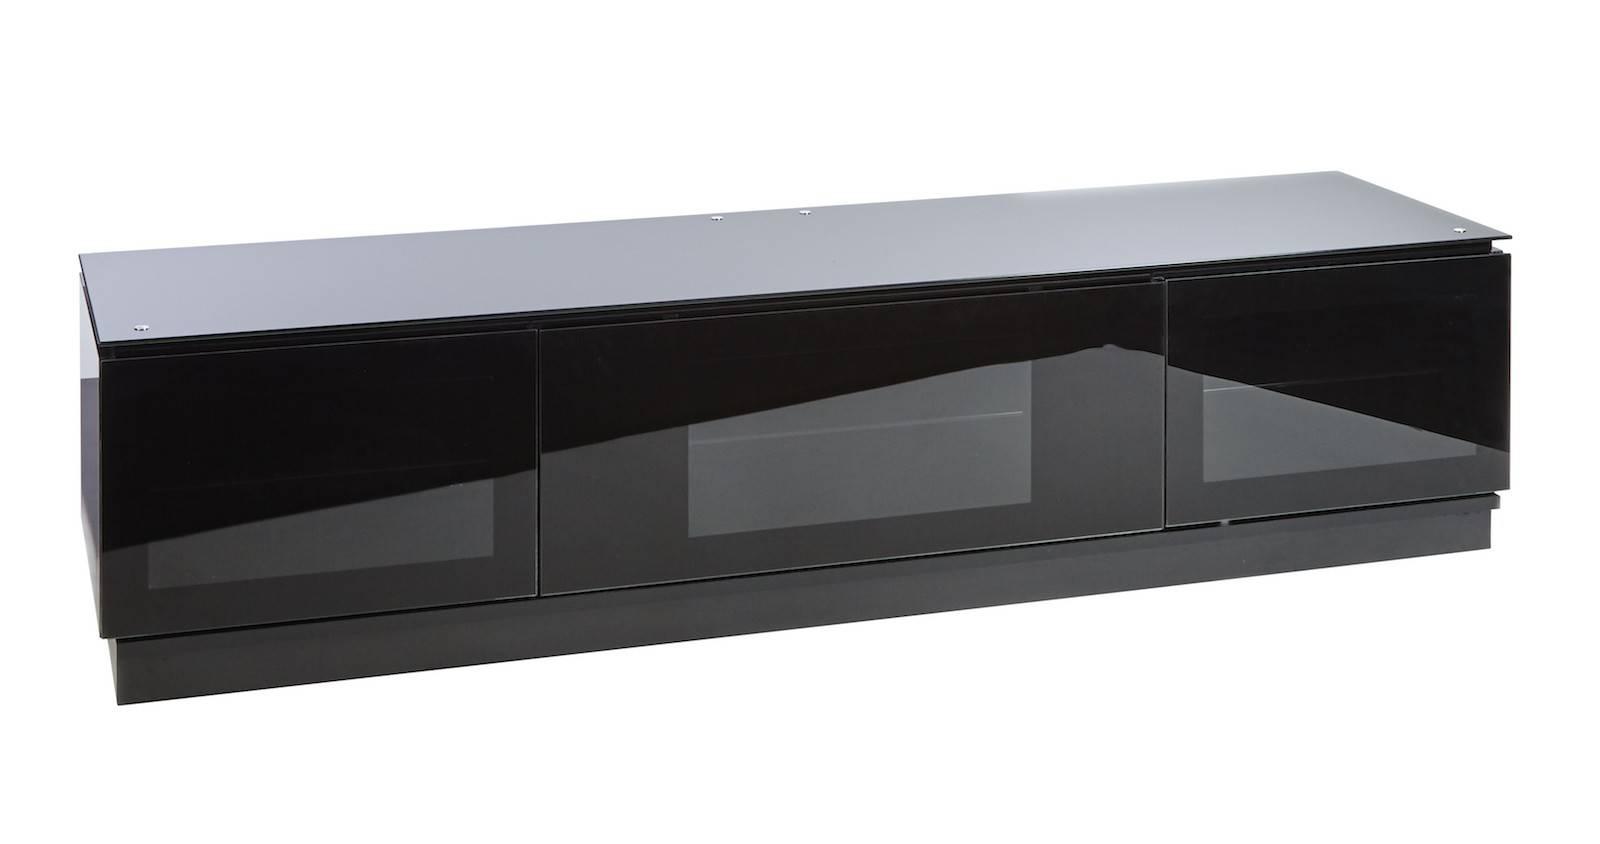 Popular Photo of Shiny Black Tv Stands